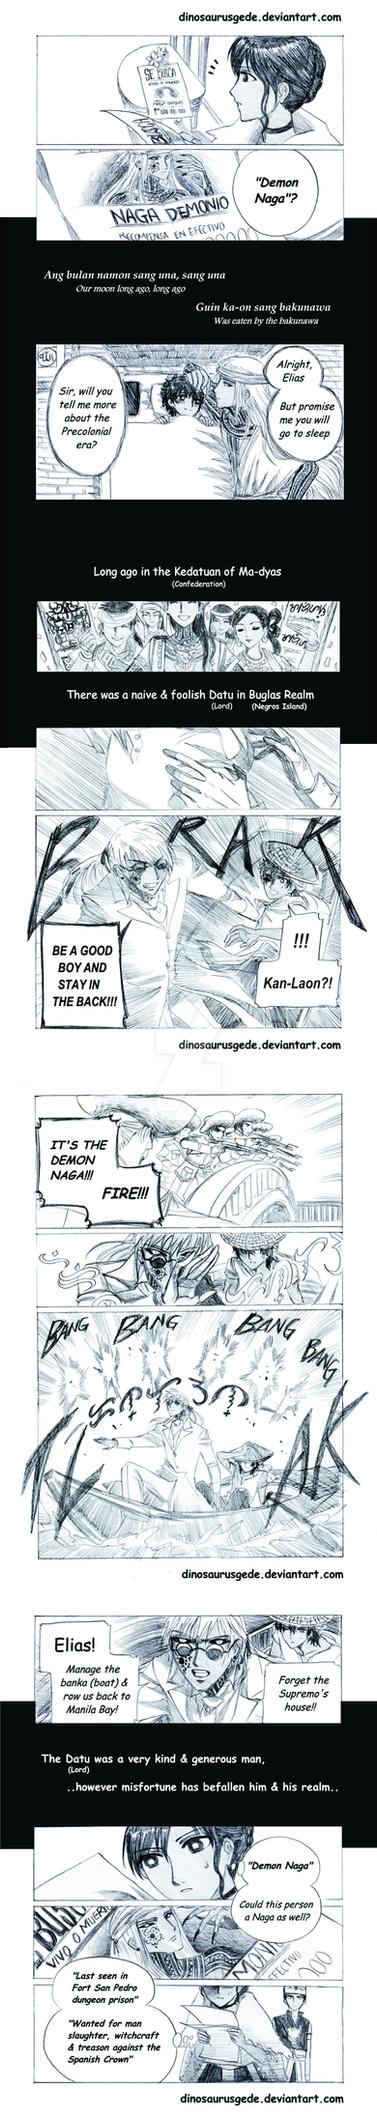 Nagaraja Chapter 4 Part 7 by dinosaurusgede